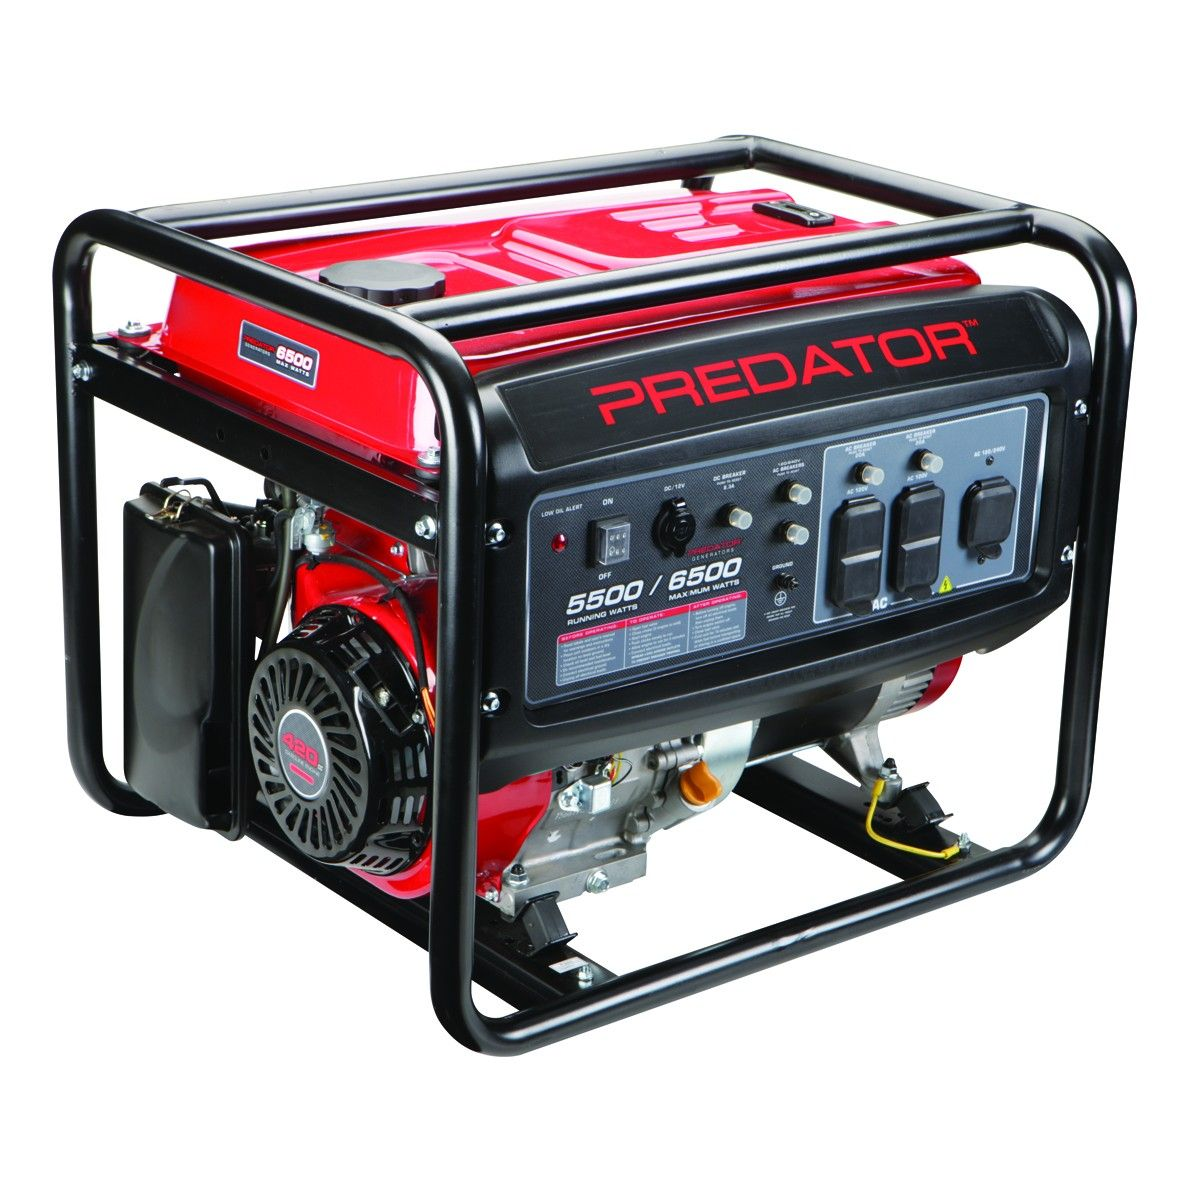 420cc 6500 watts max5500 watts rated portable generator